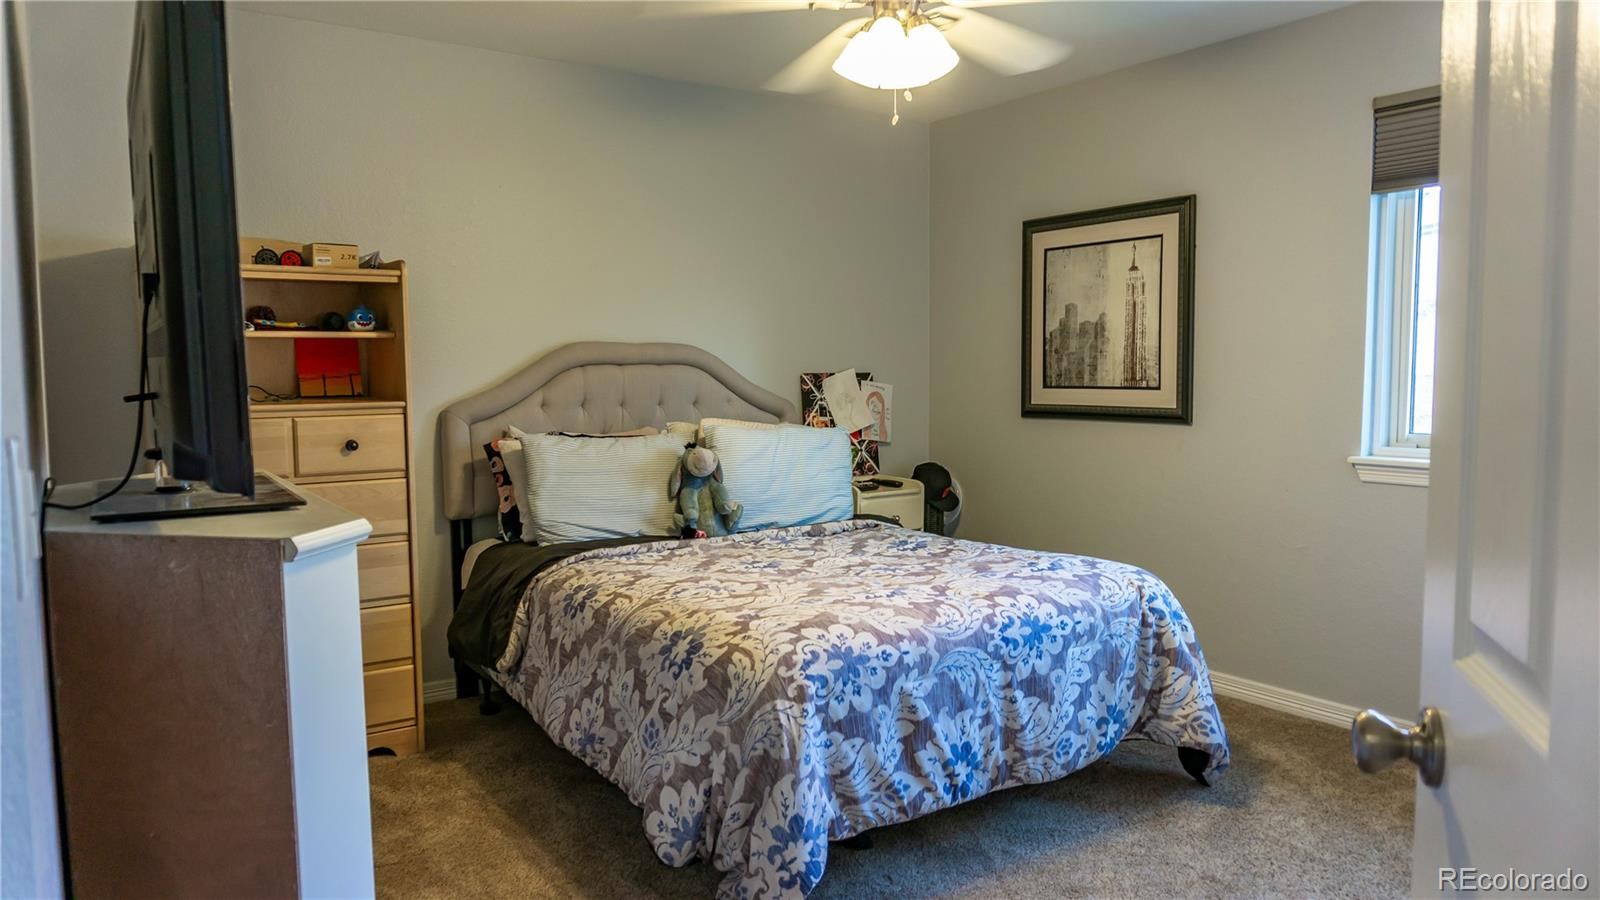 MLS# 7352042 - 13 - 240 Sylvestor Place, Highlands Ranch, CO 80129